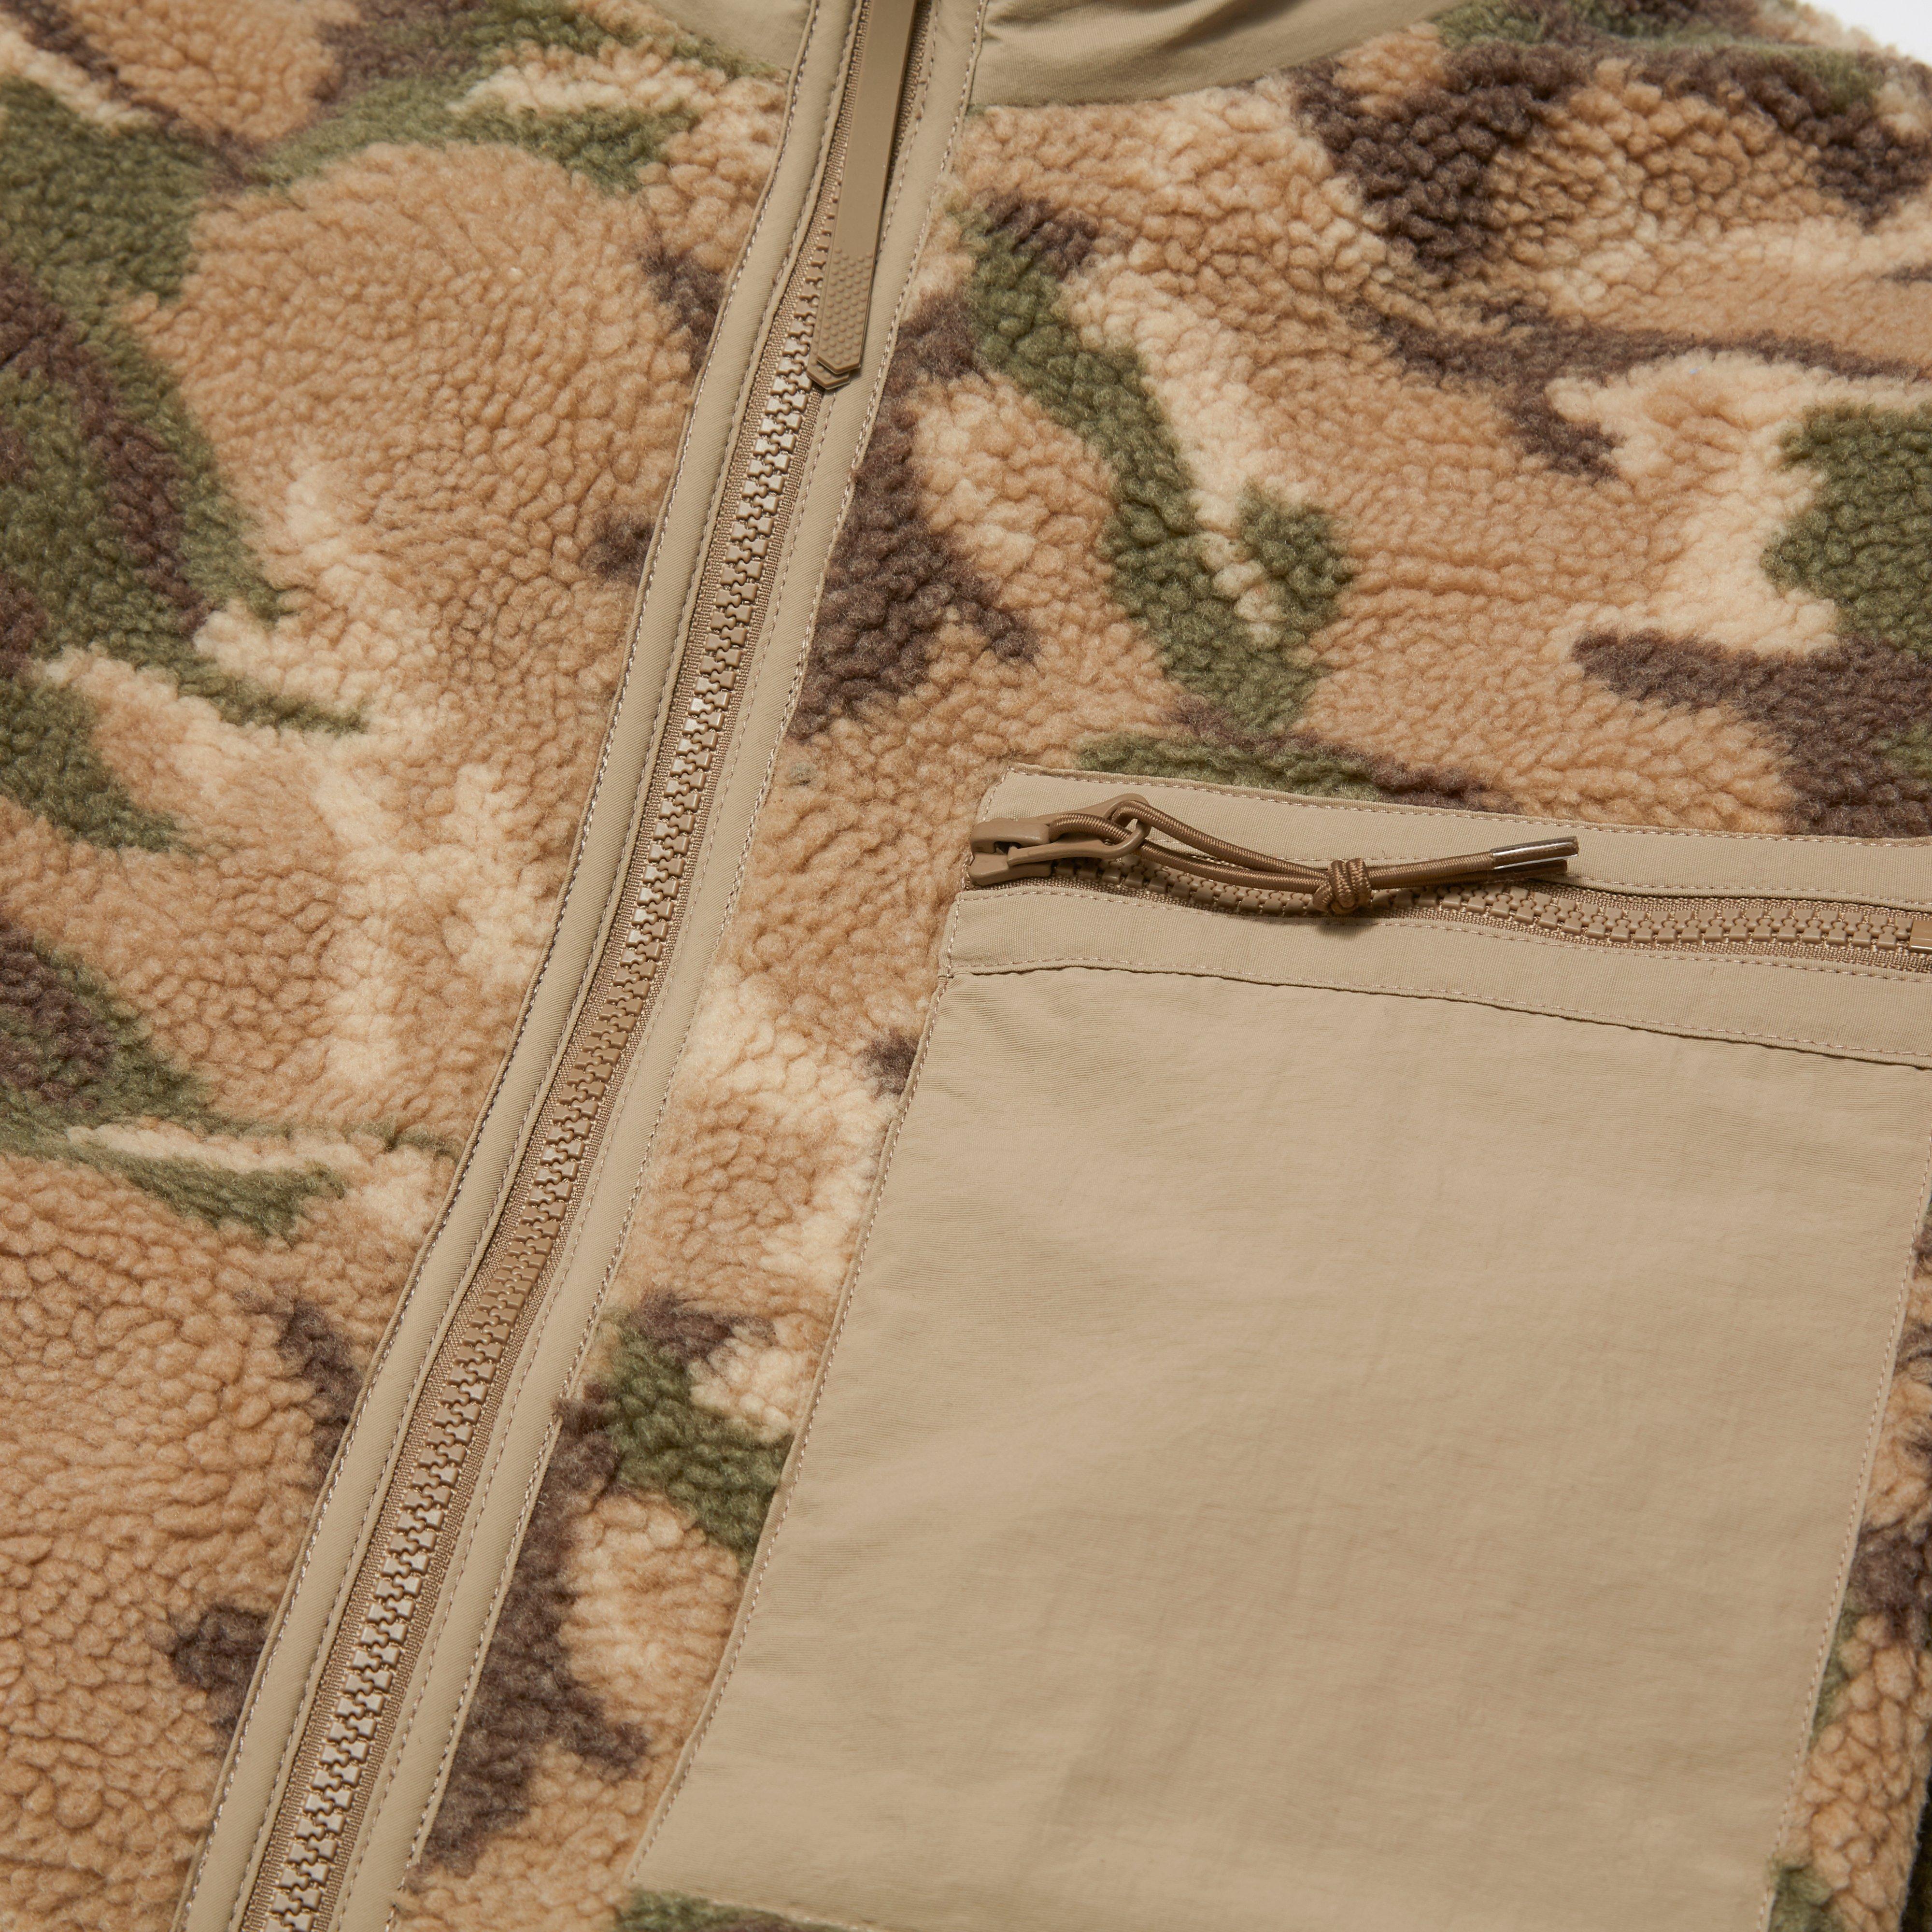 Penfield Natick Chinchilla Fleece in Beige (Natural) for Men